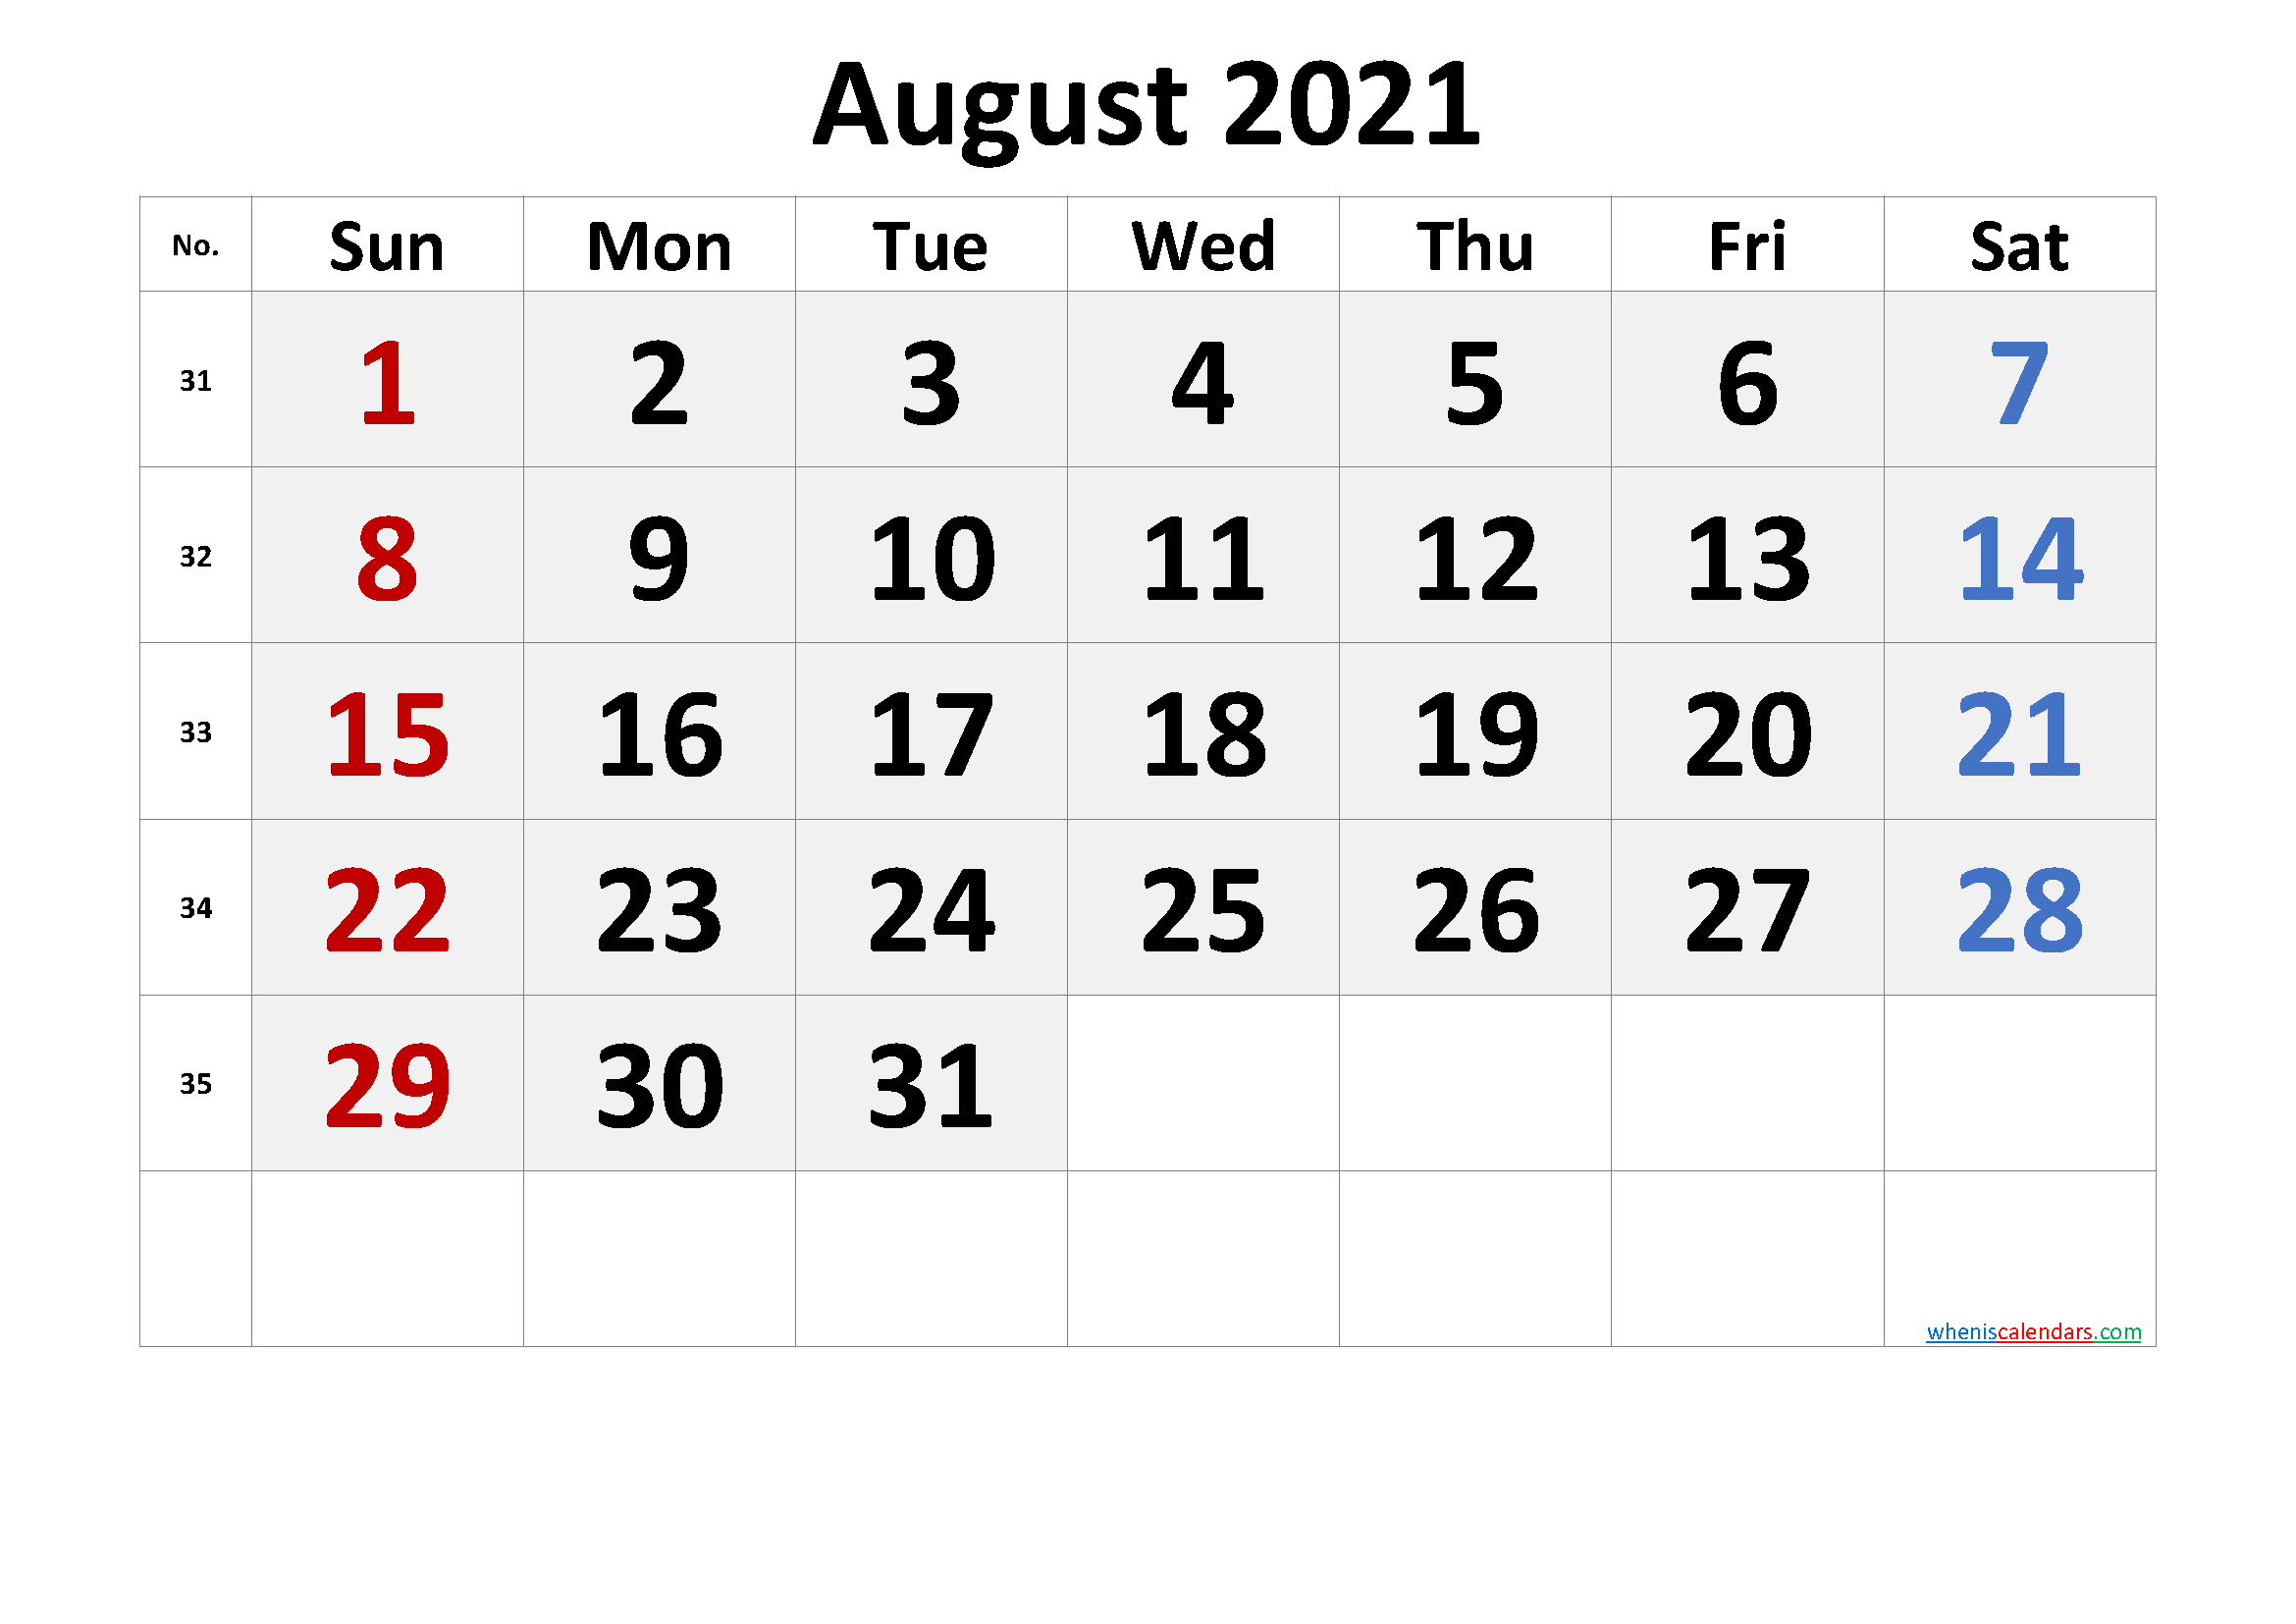 August 2021 Calendar With Holidays   Printable Calendars 2021 with August 2021 Calendar Print